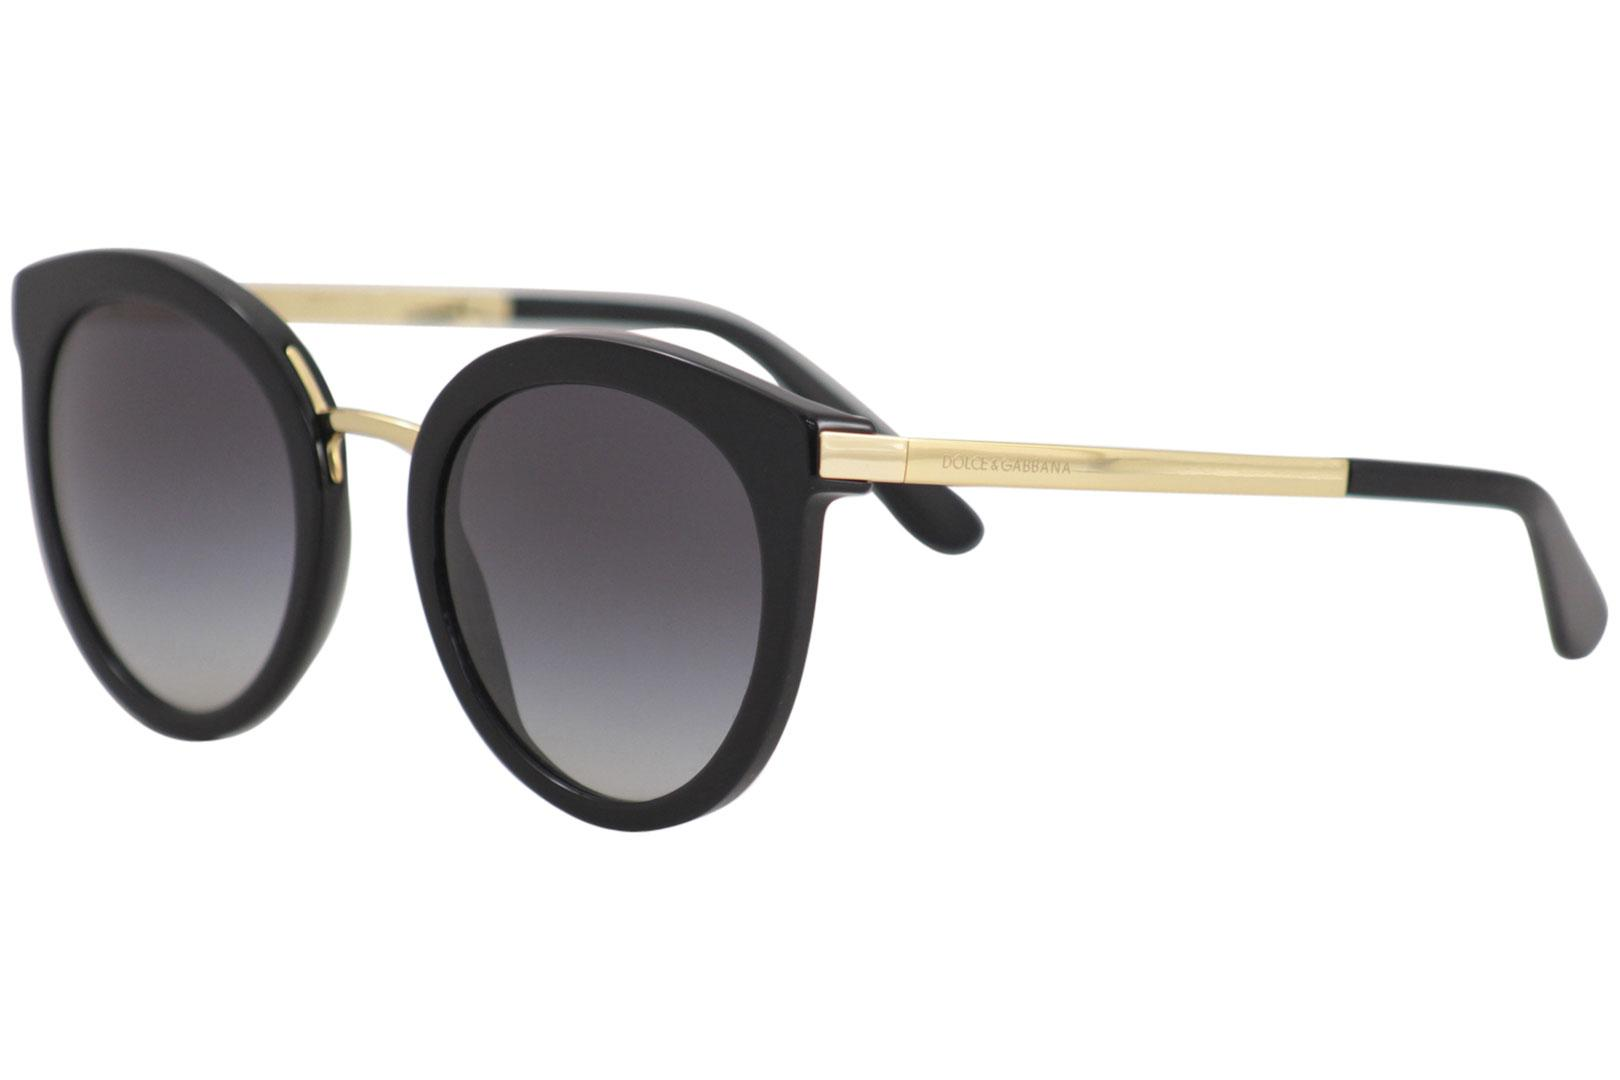 24f7e795fc9f4 Dolce   Gabbana D G DG4268 DG 4268 501 8G Black Gold Round ...